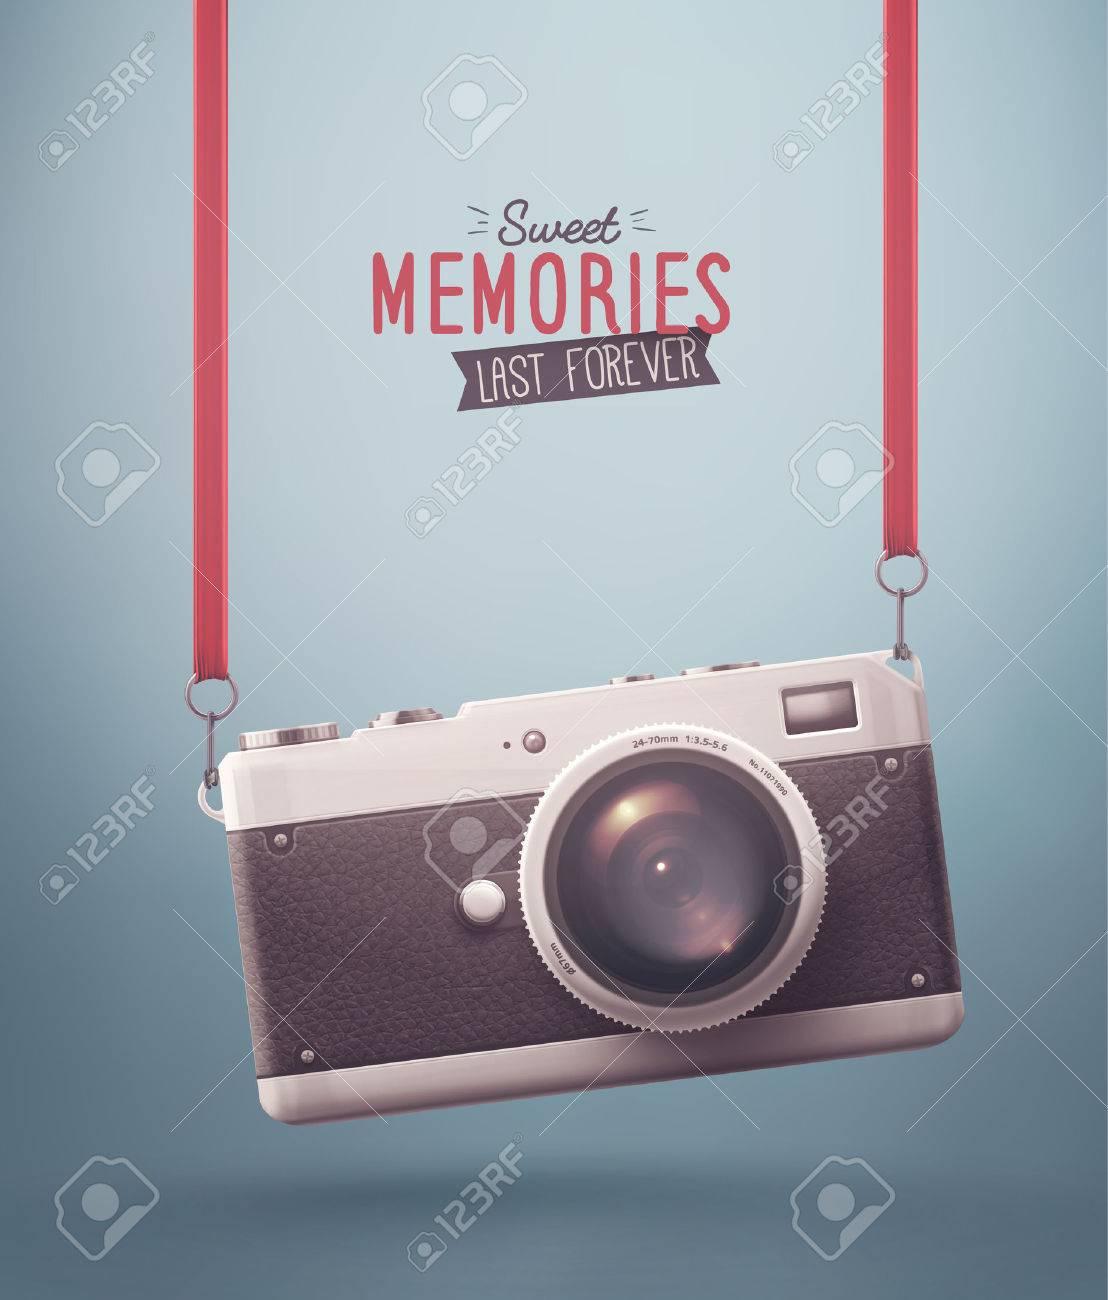 Hanging retro camera, sweet memories, eps 10 Standard-Bild - 43327858